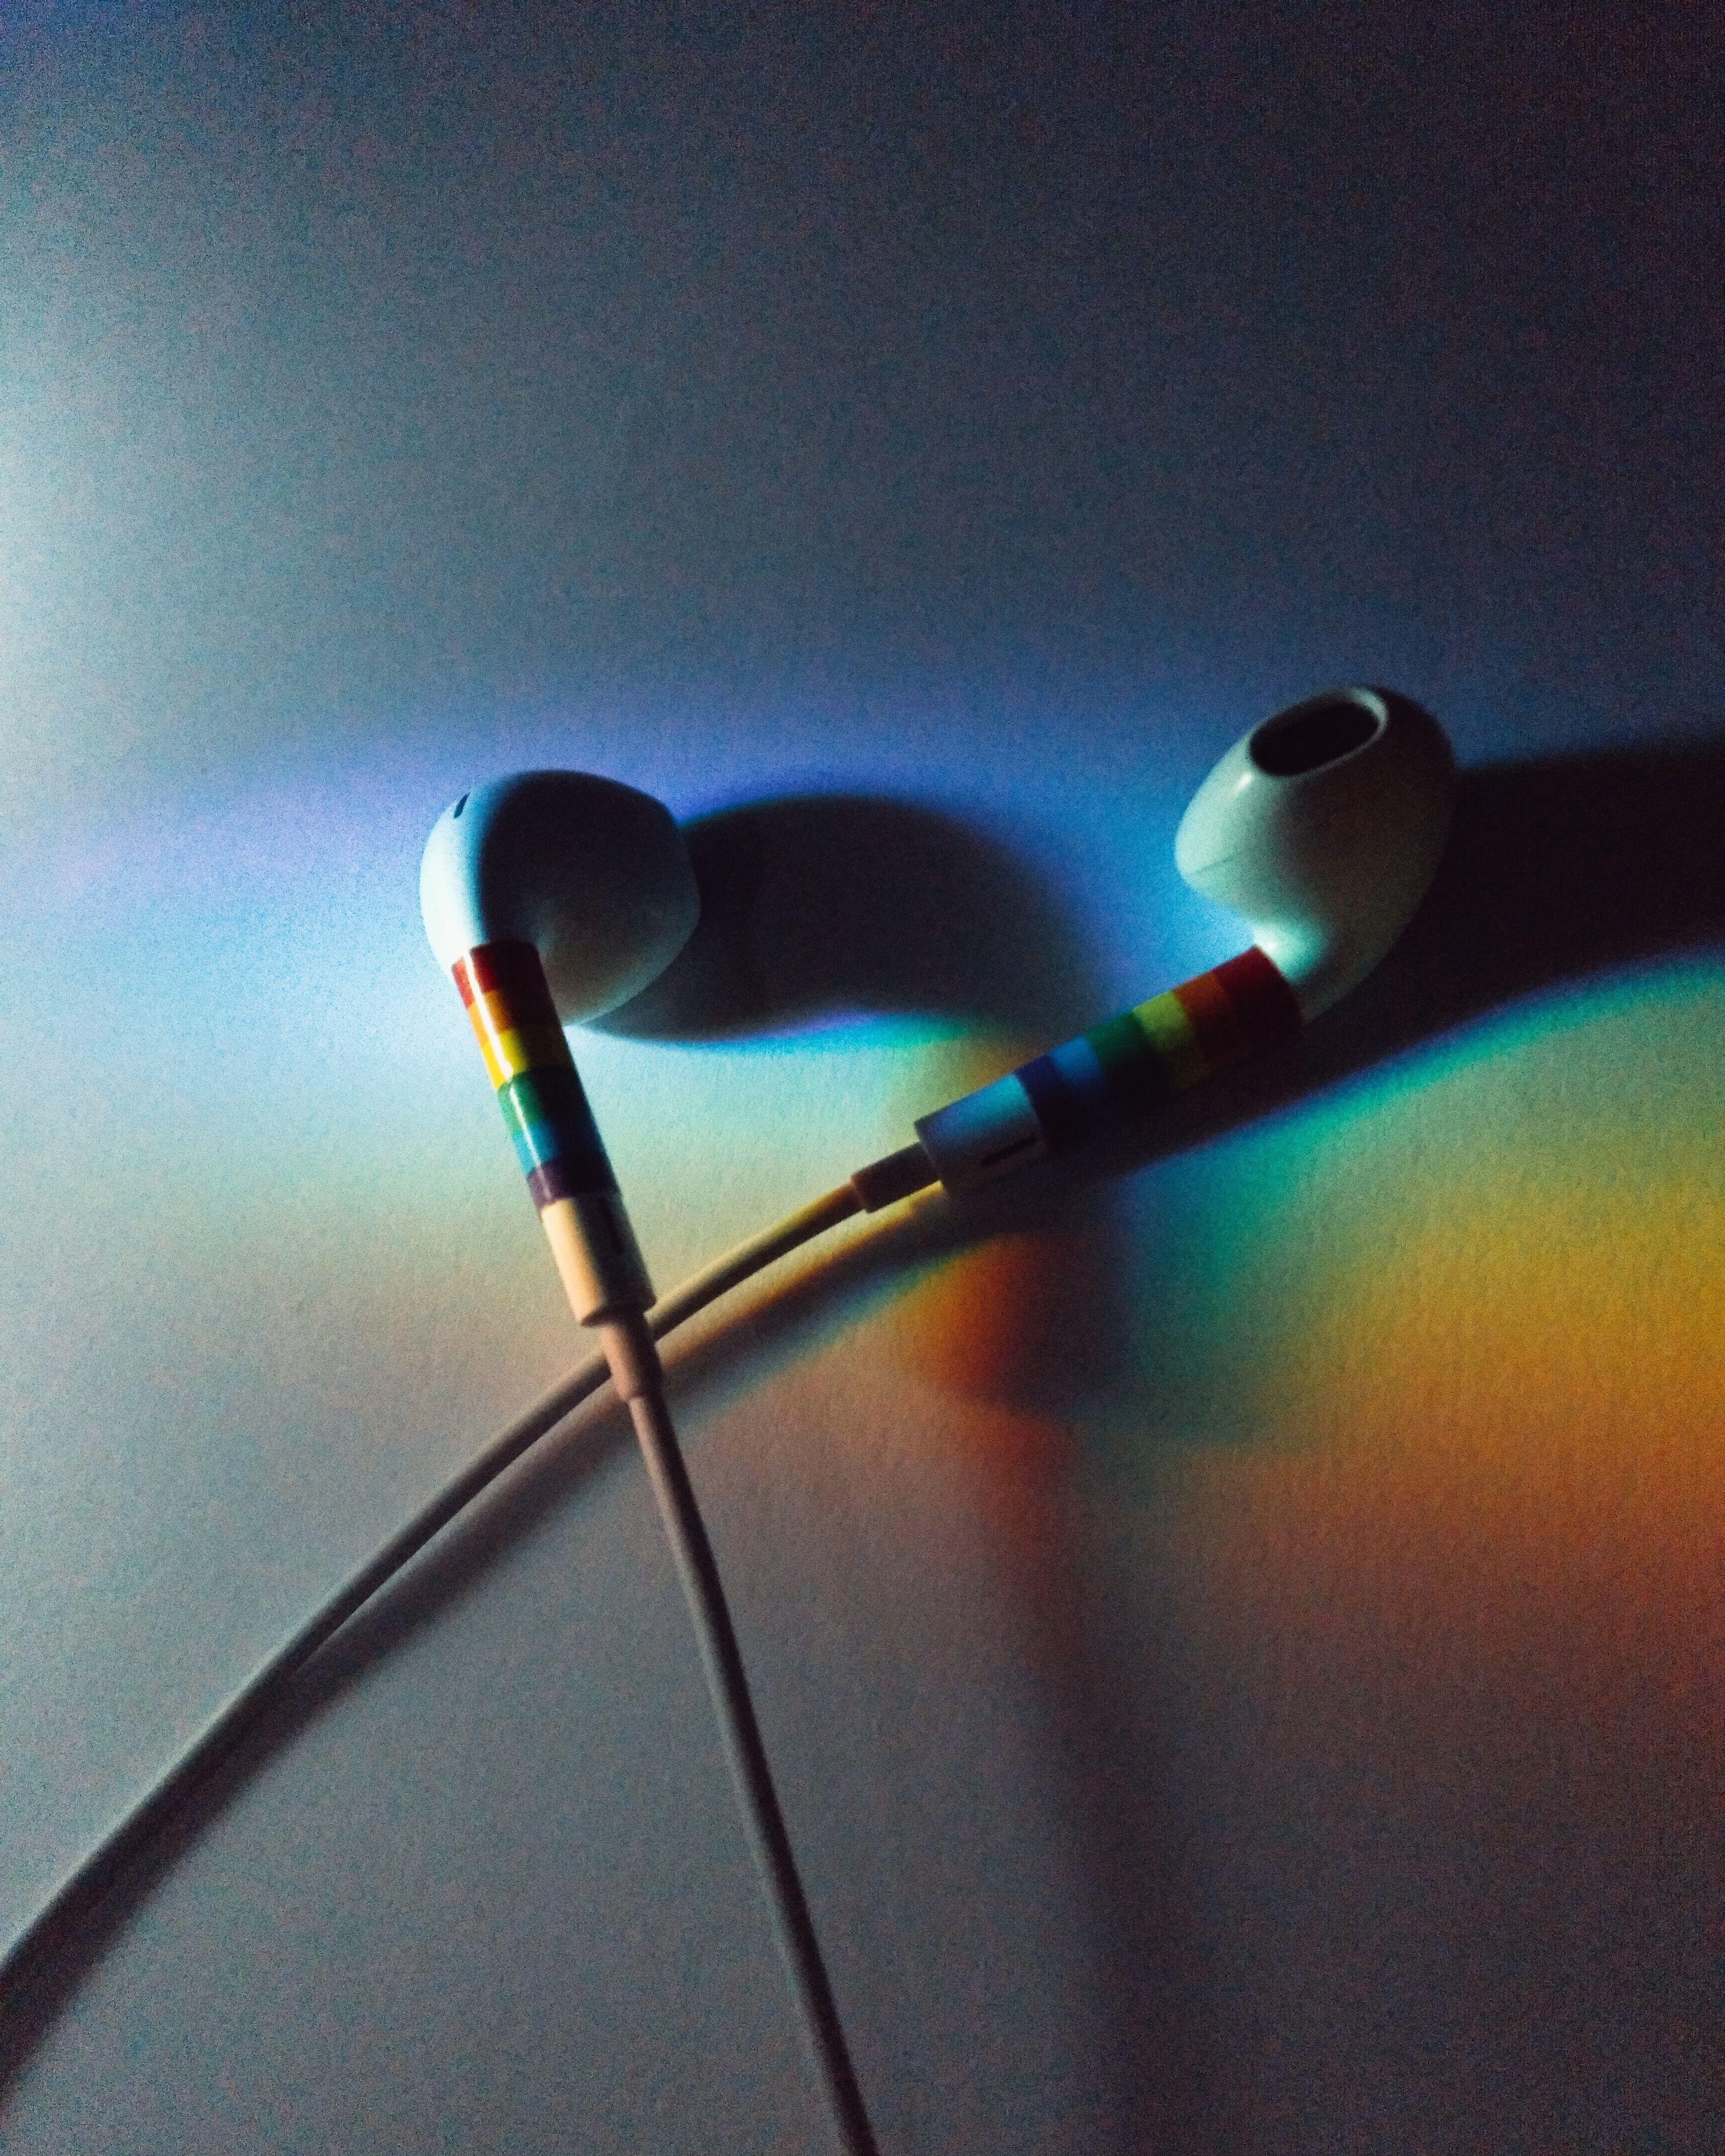 Pride Earphones Rainbow Aesthetic Rain Wallpapers Music Wallpaper